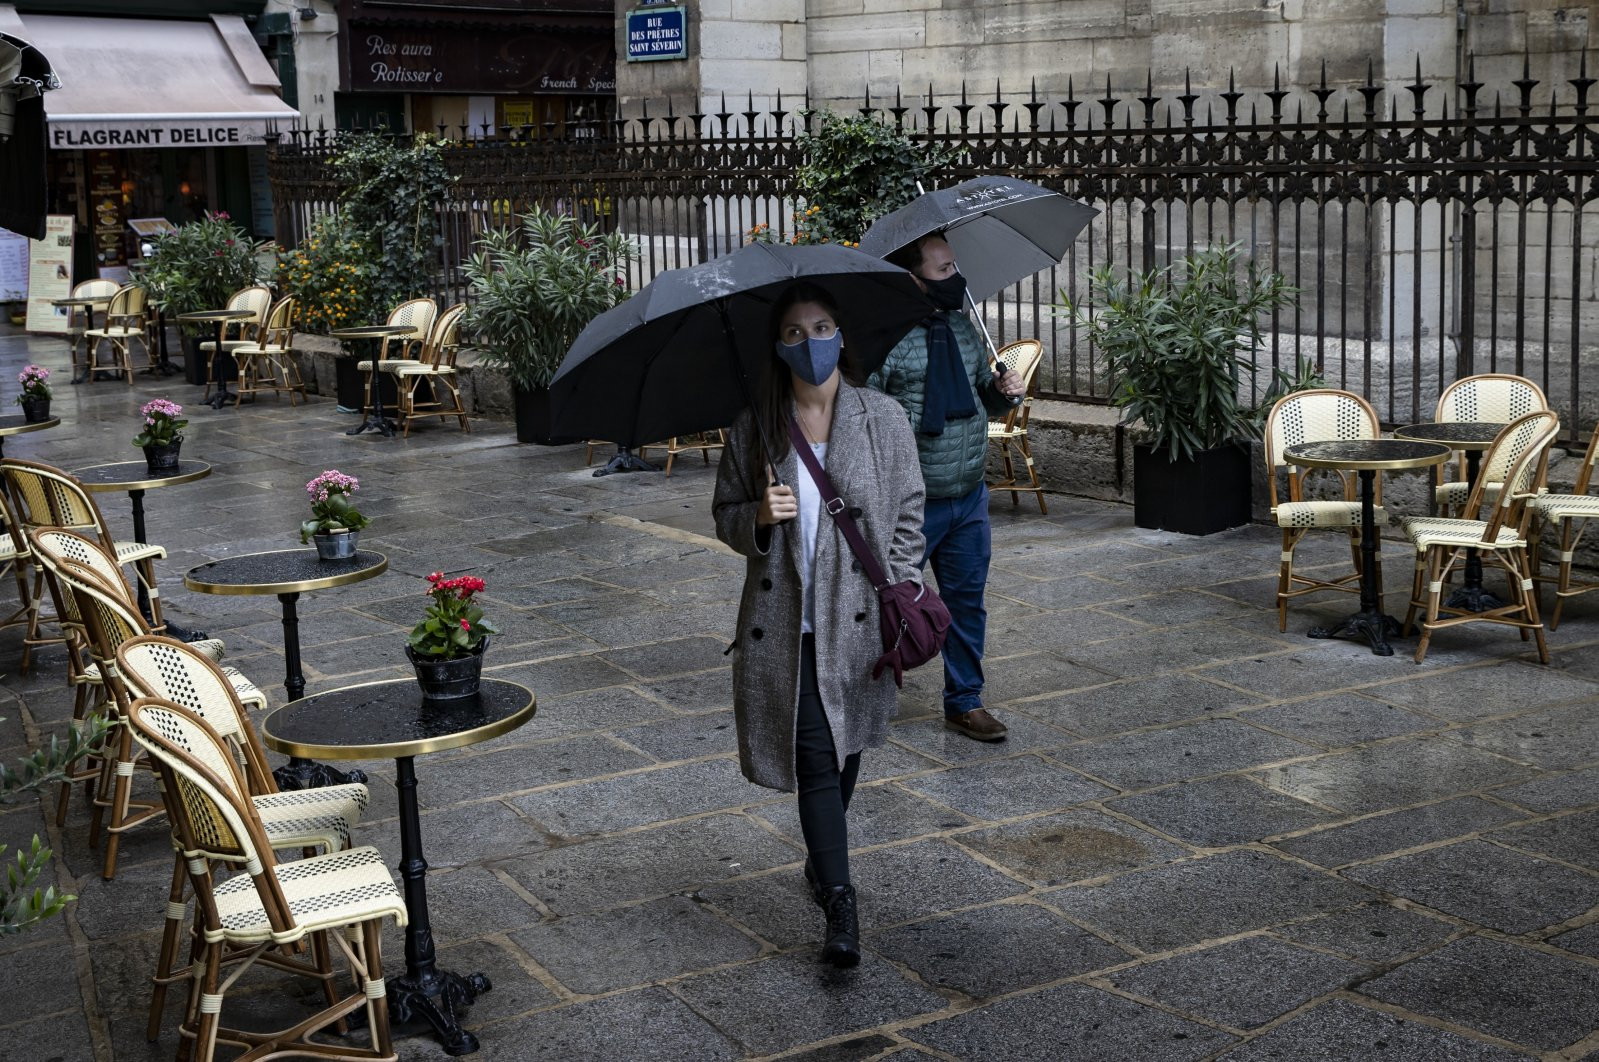 A couple of pedestrians wearing protective face masks walk past a deserted bistrot terrace, Paris, Sept. 25, 2020. (EPA Photo)